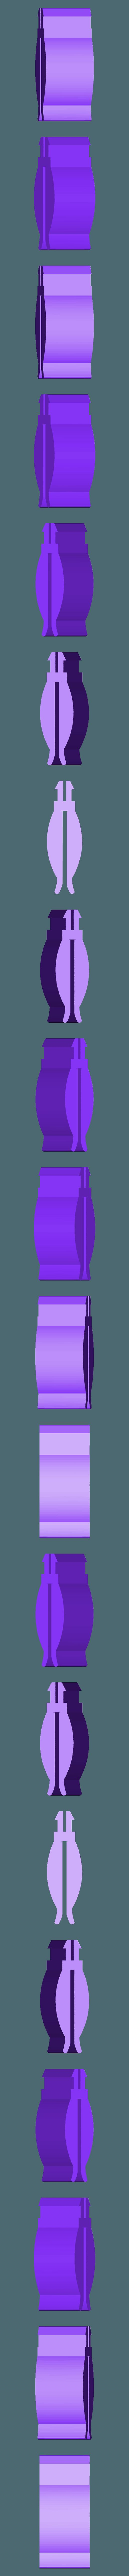 clip_gb_v1.stl Download free STL file Car Vent Gravity Phone Holder • 3D printable template, jurekkb